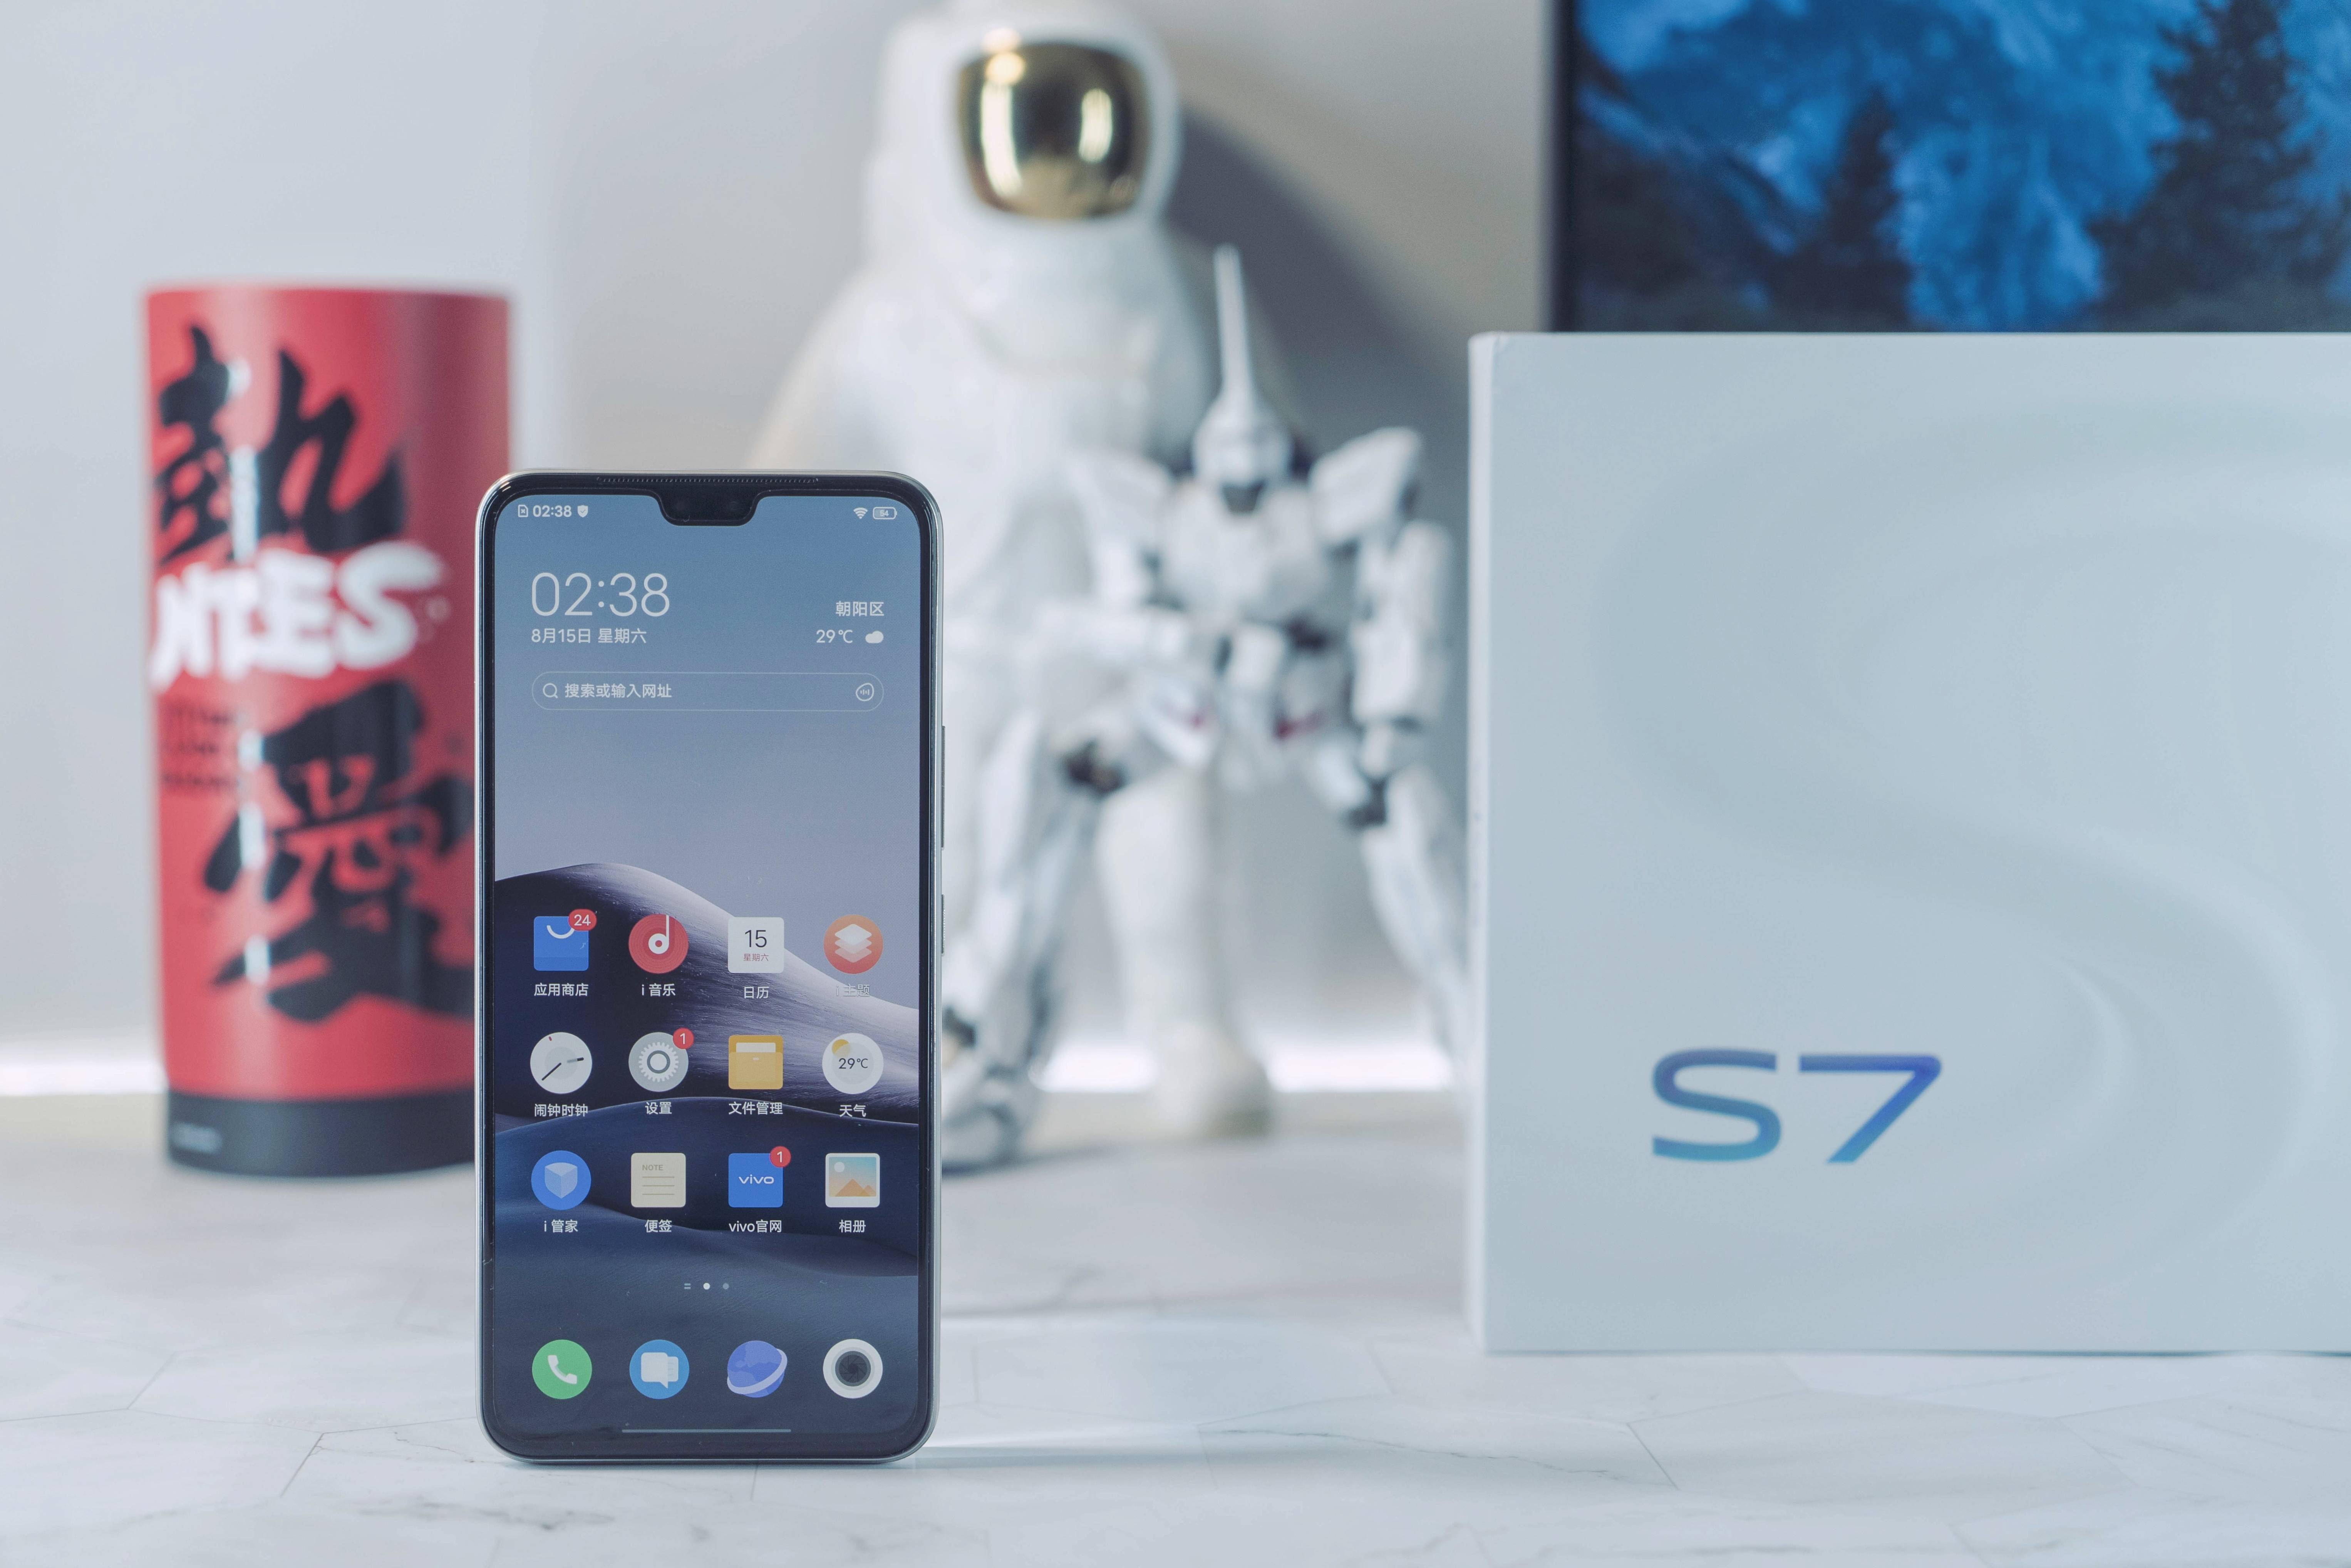 vivo S7全面评测:最轻薄5G手机,性能阉割了吗?